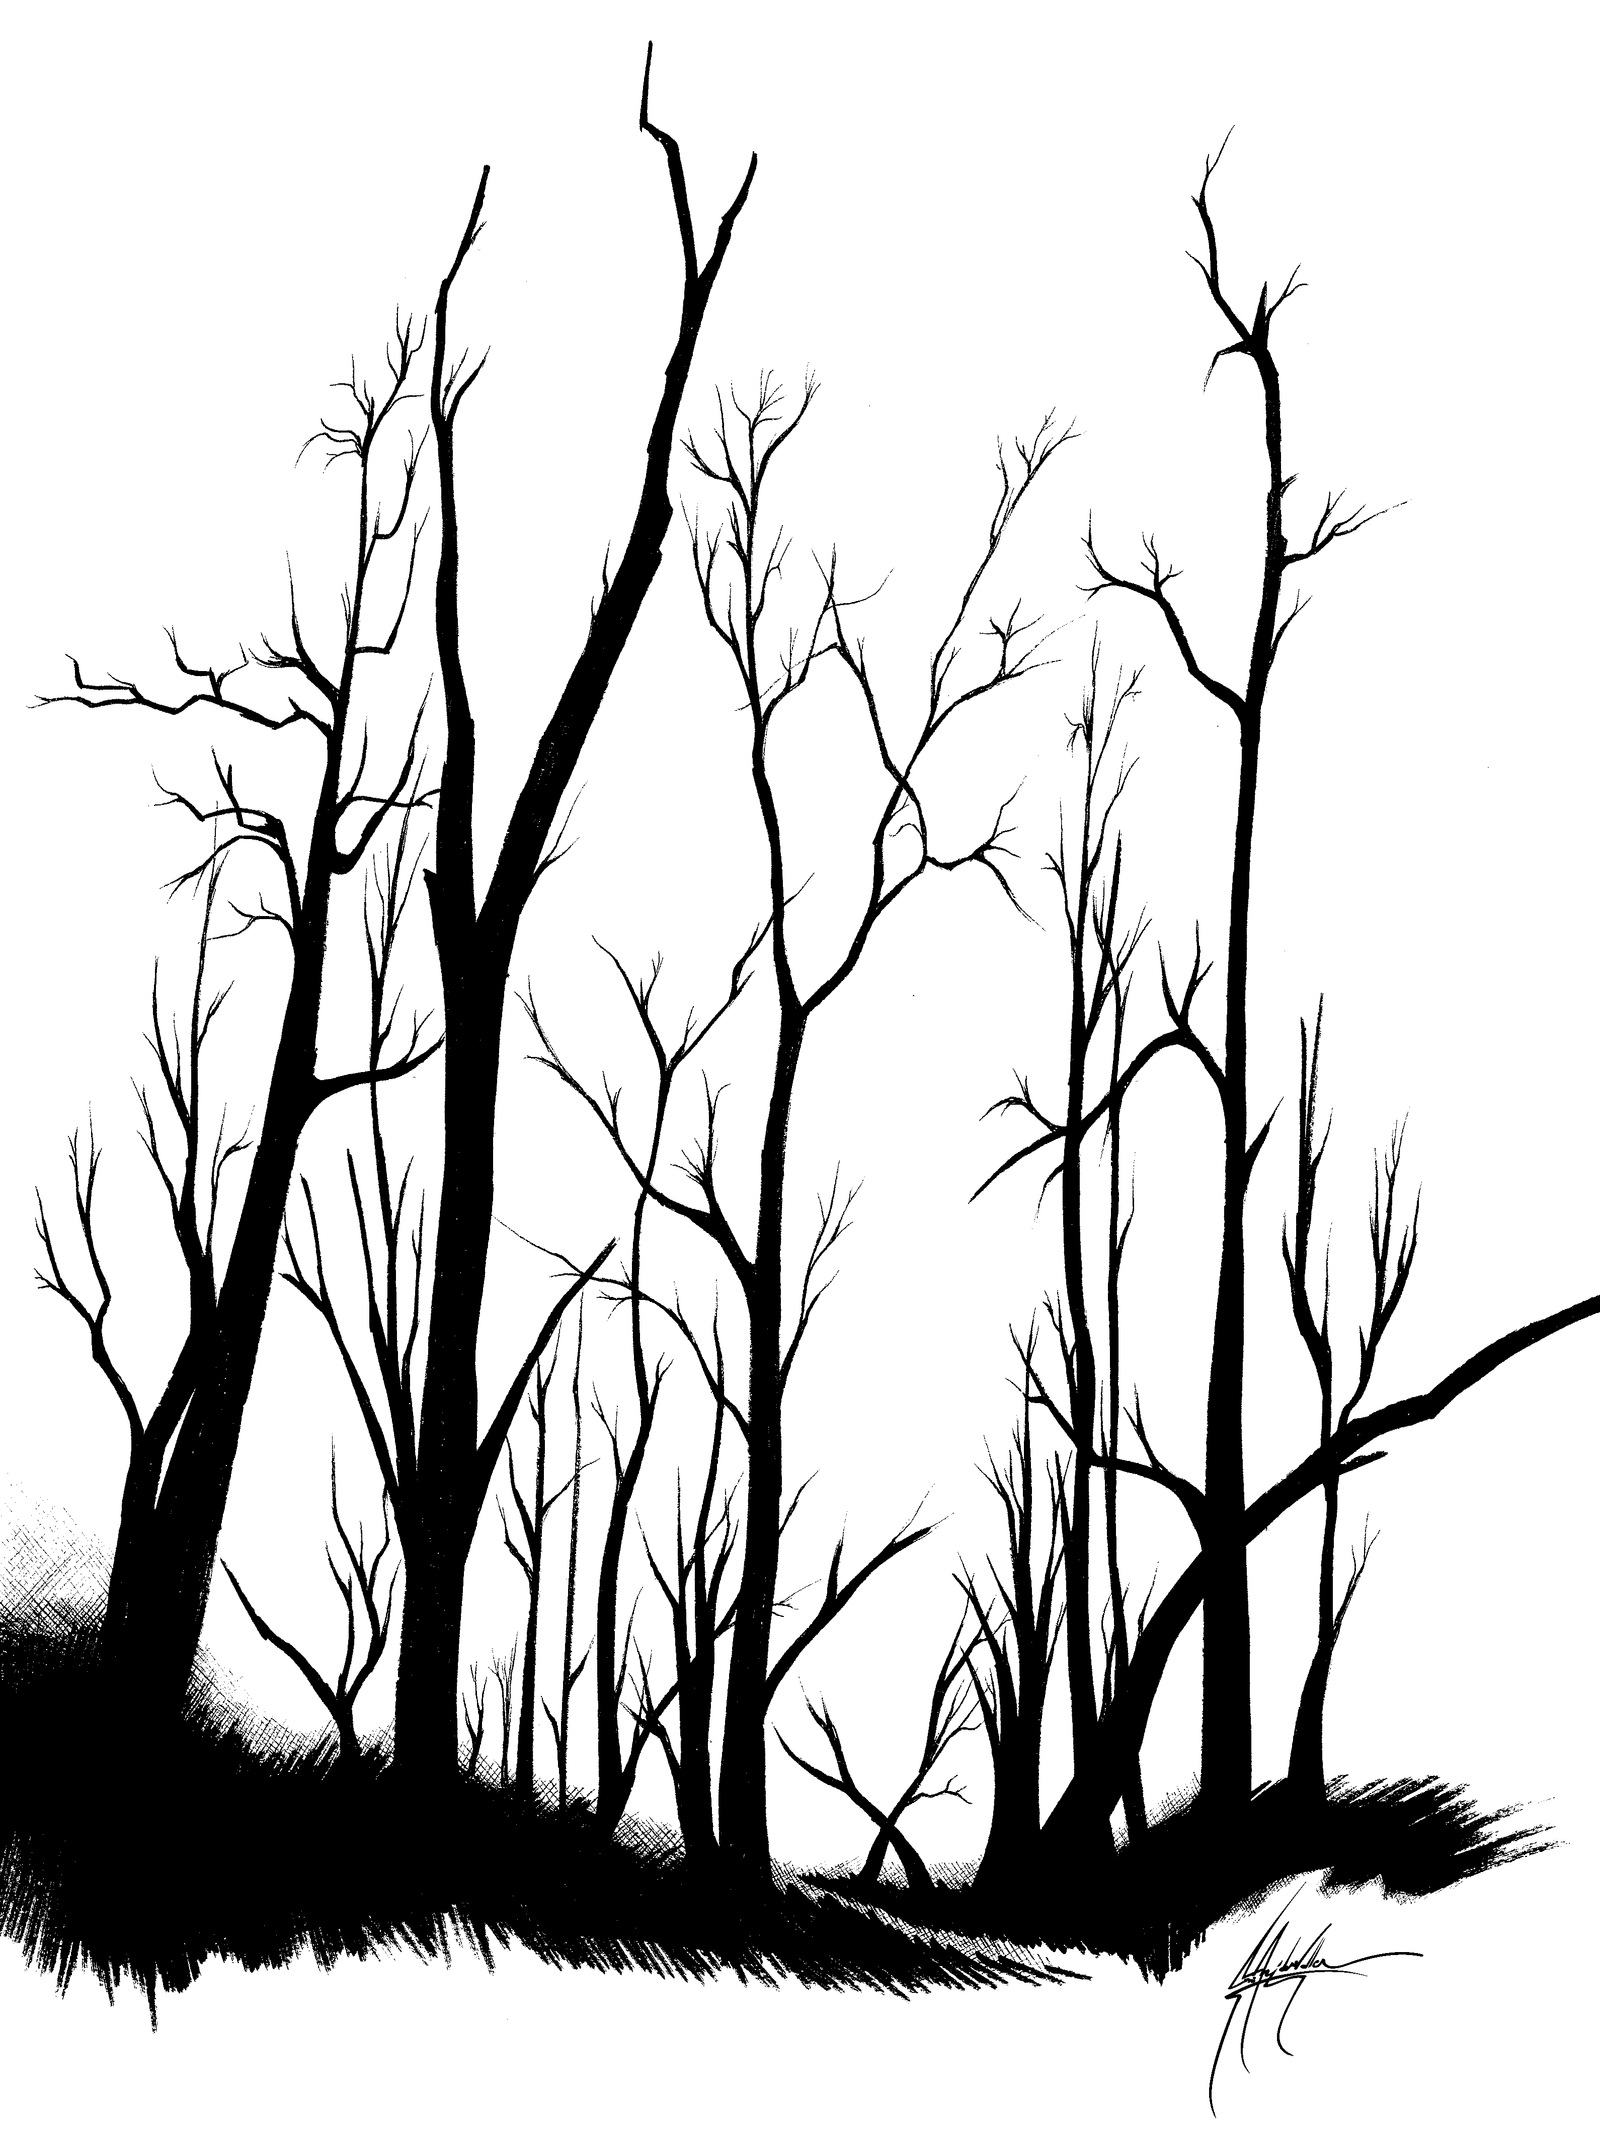 Trees by CAVIII